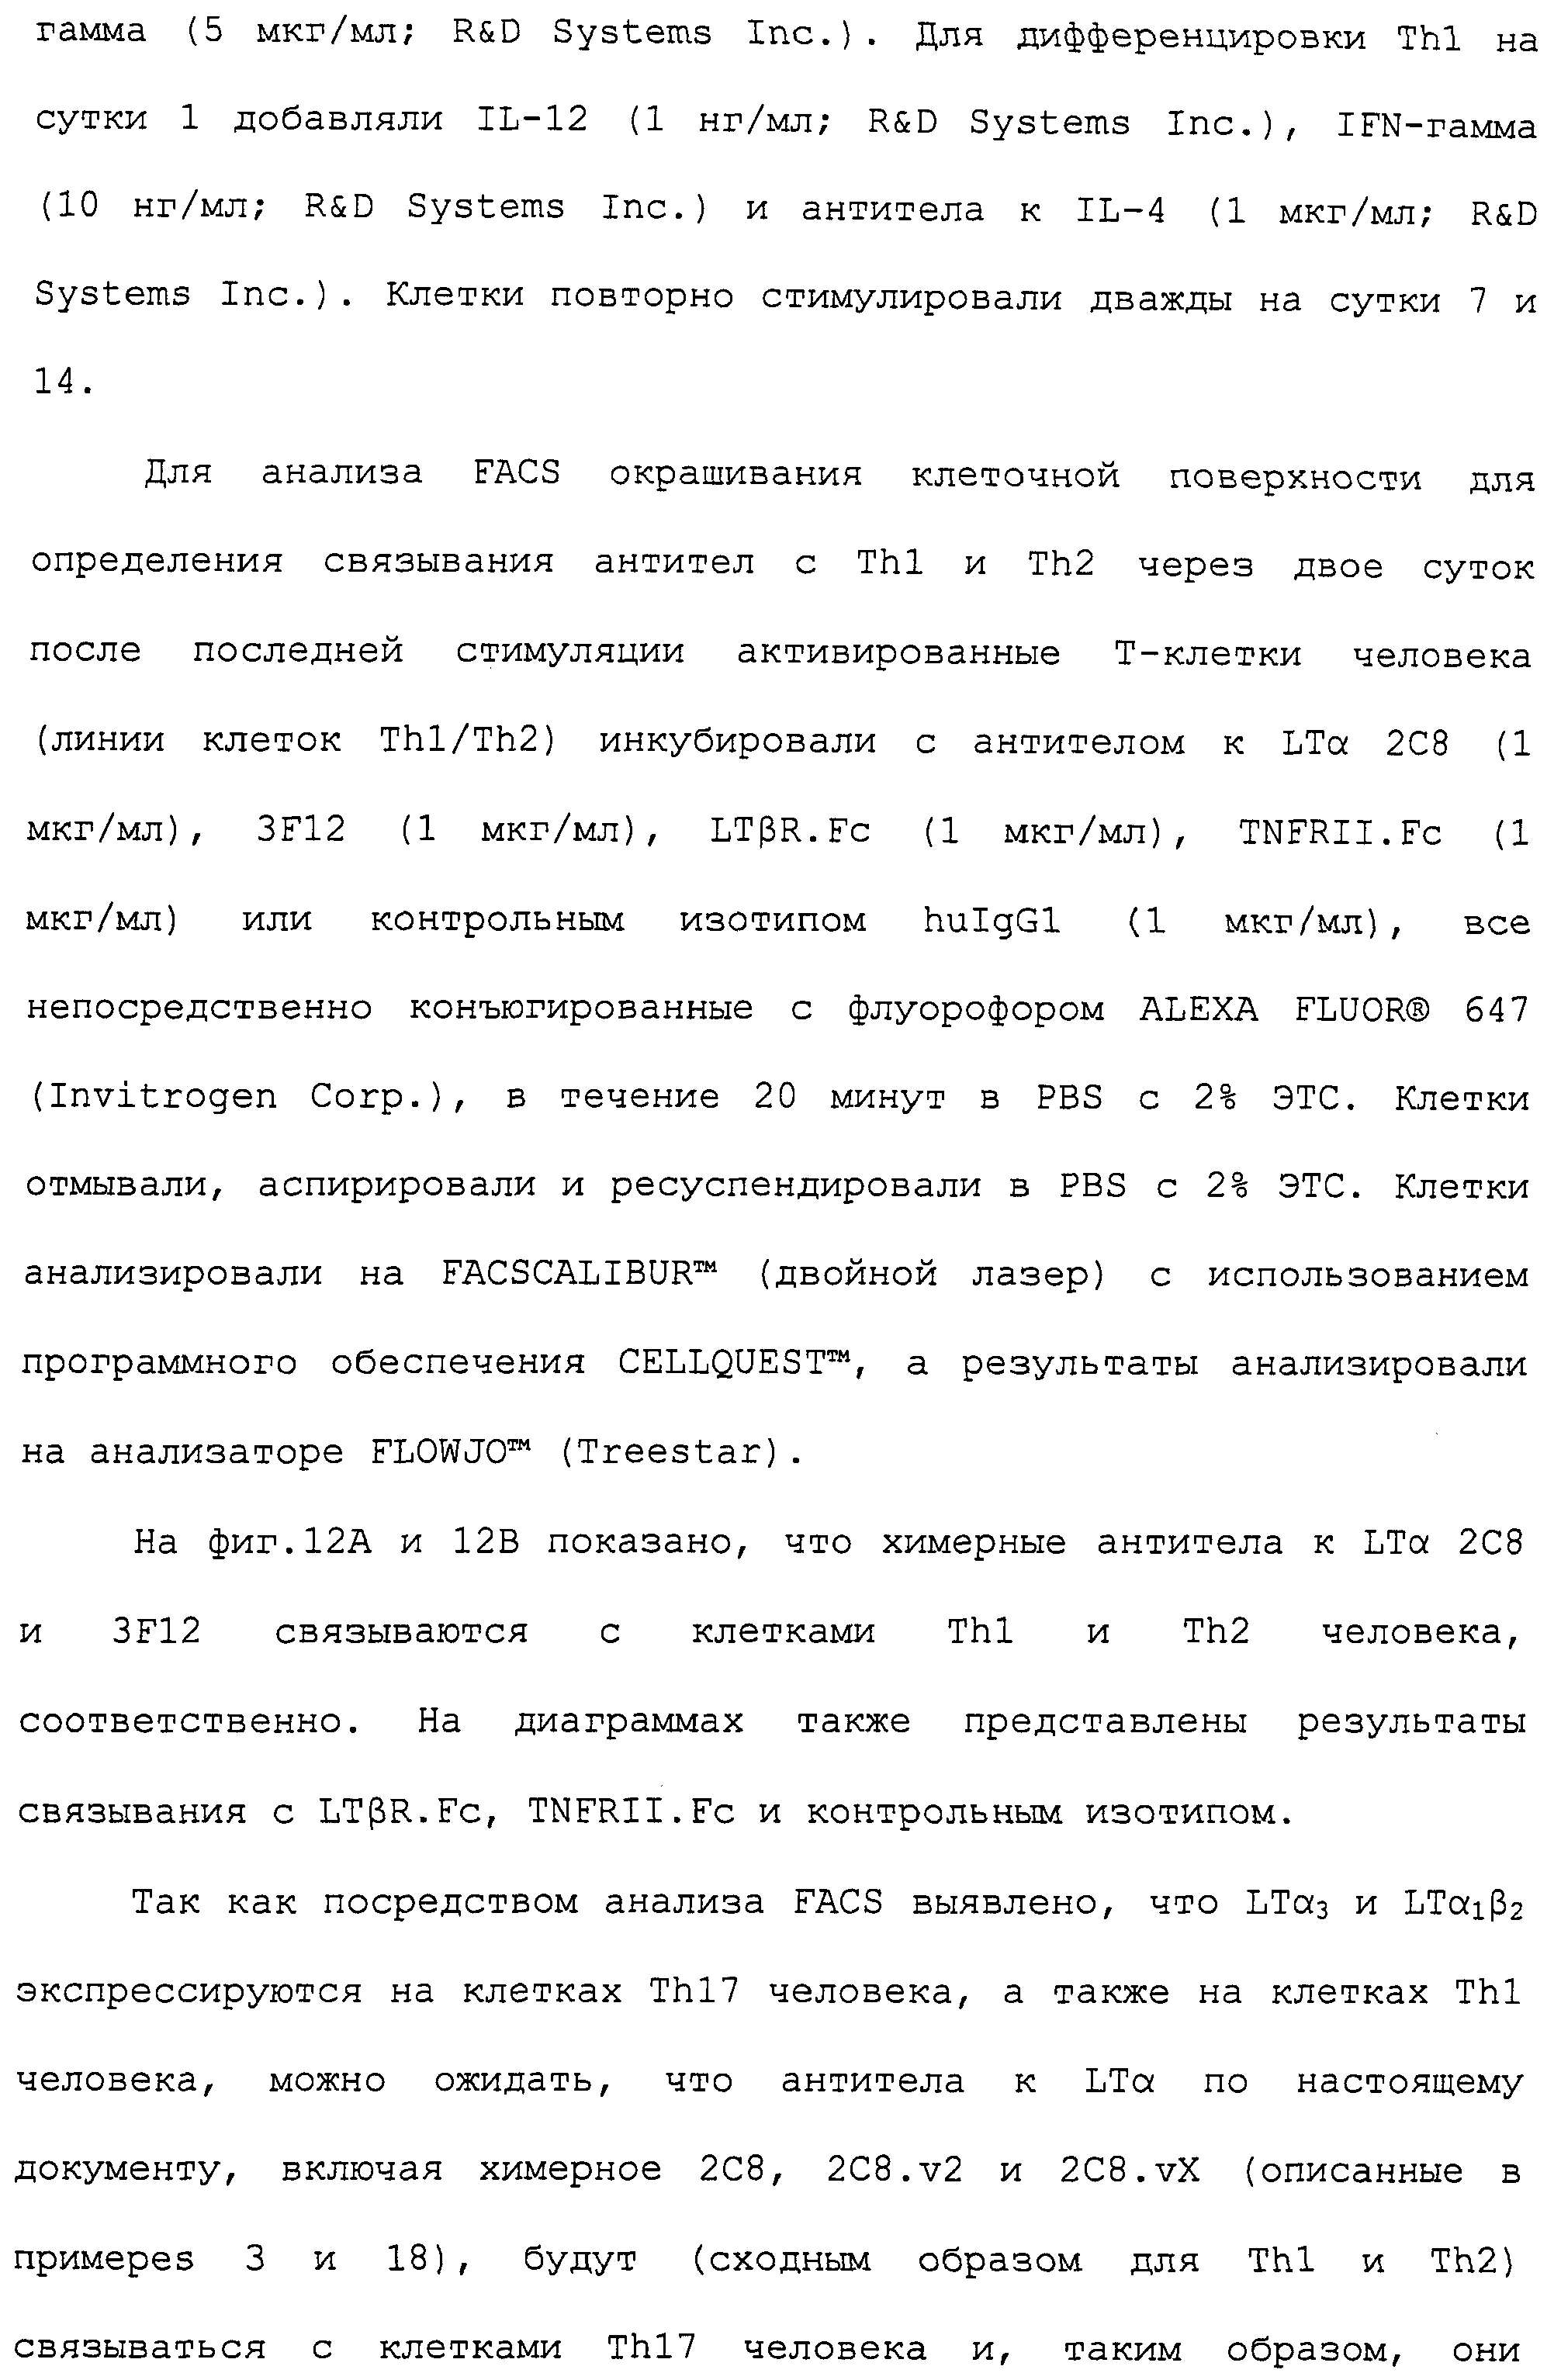 Figure 00000266